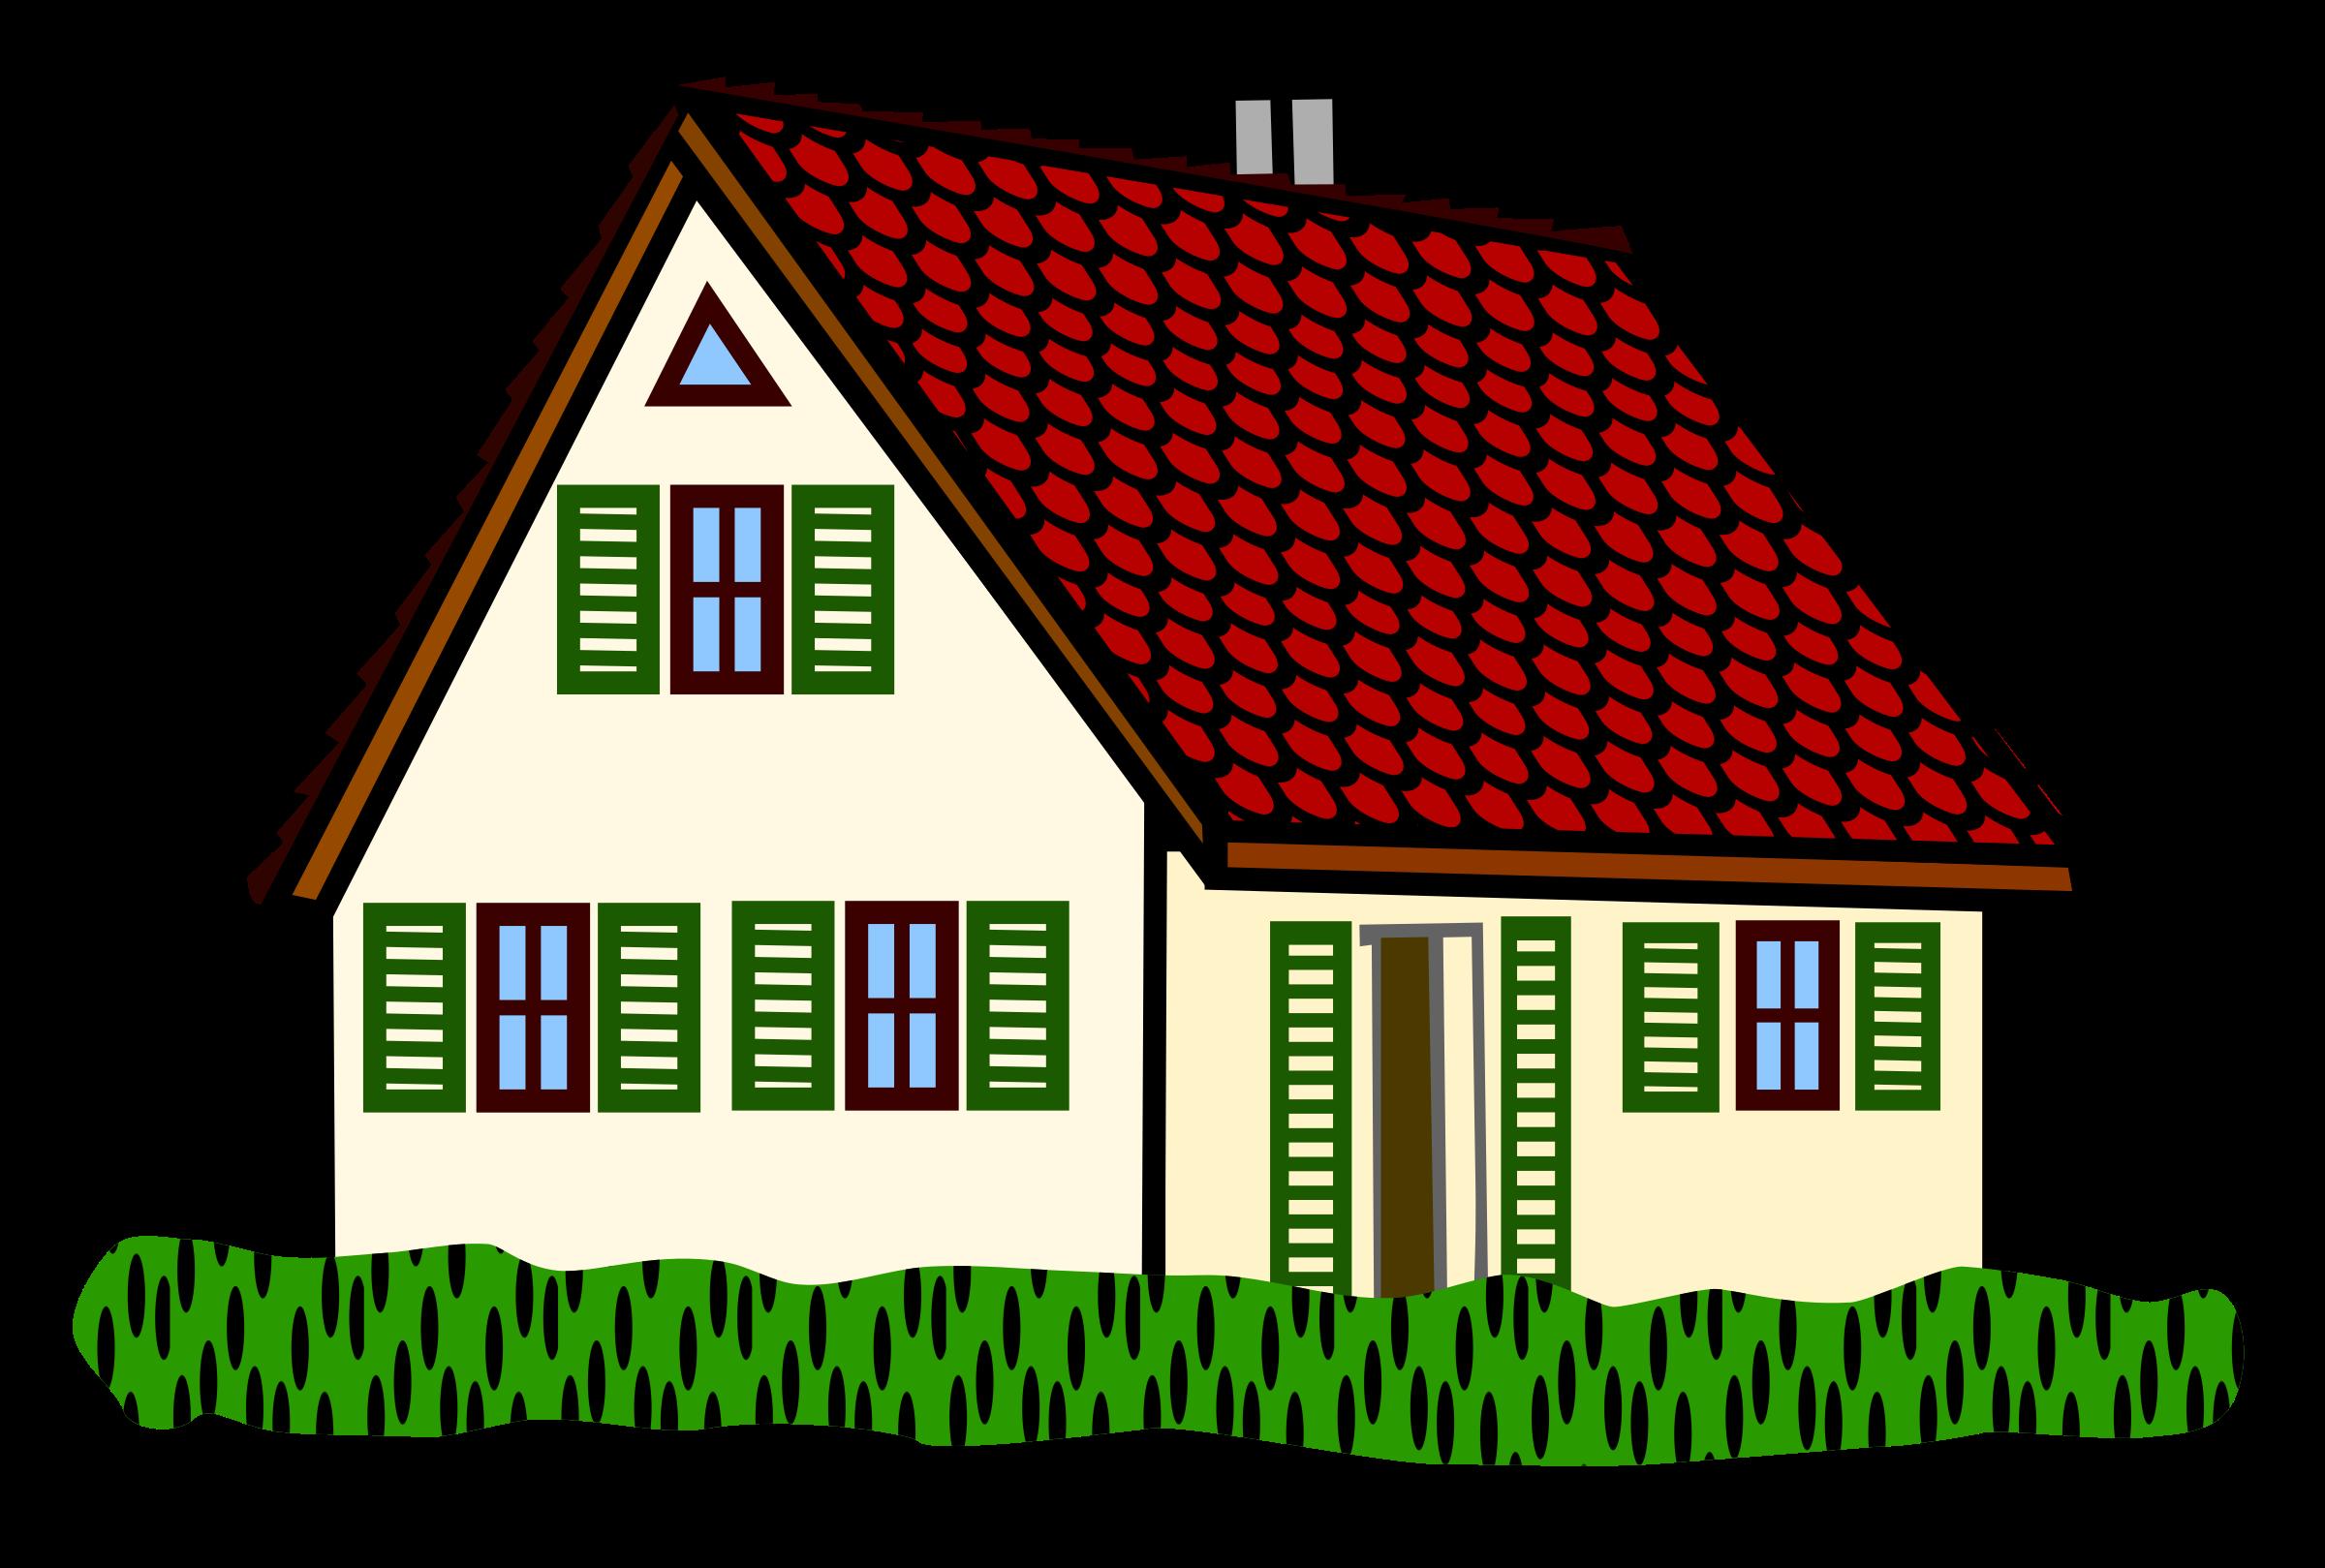 Big House Clip Art - ClipArt Best